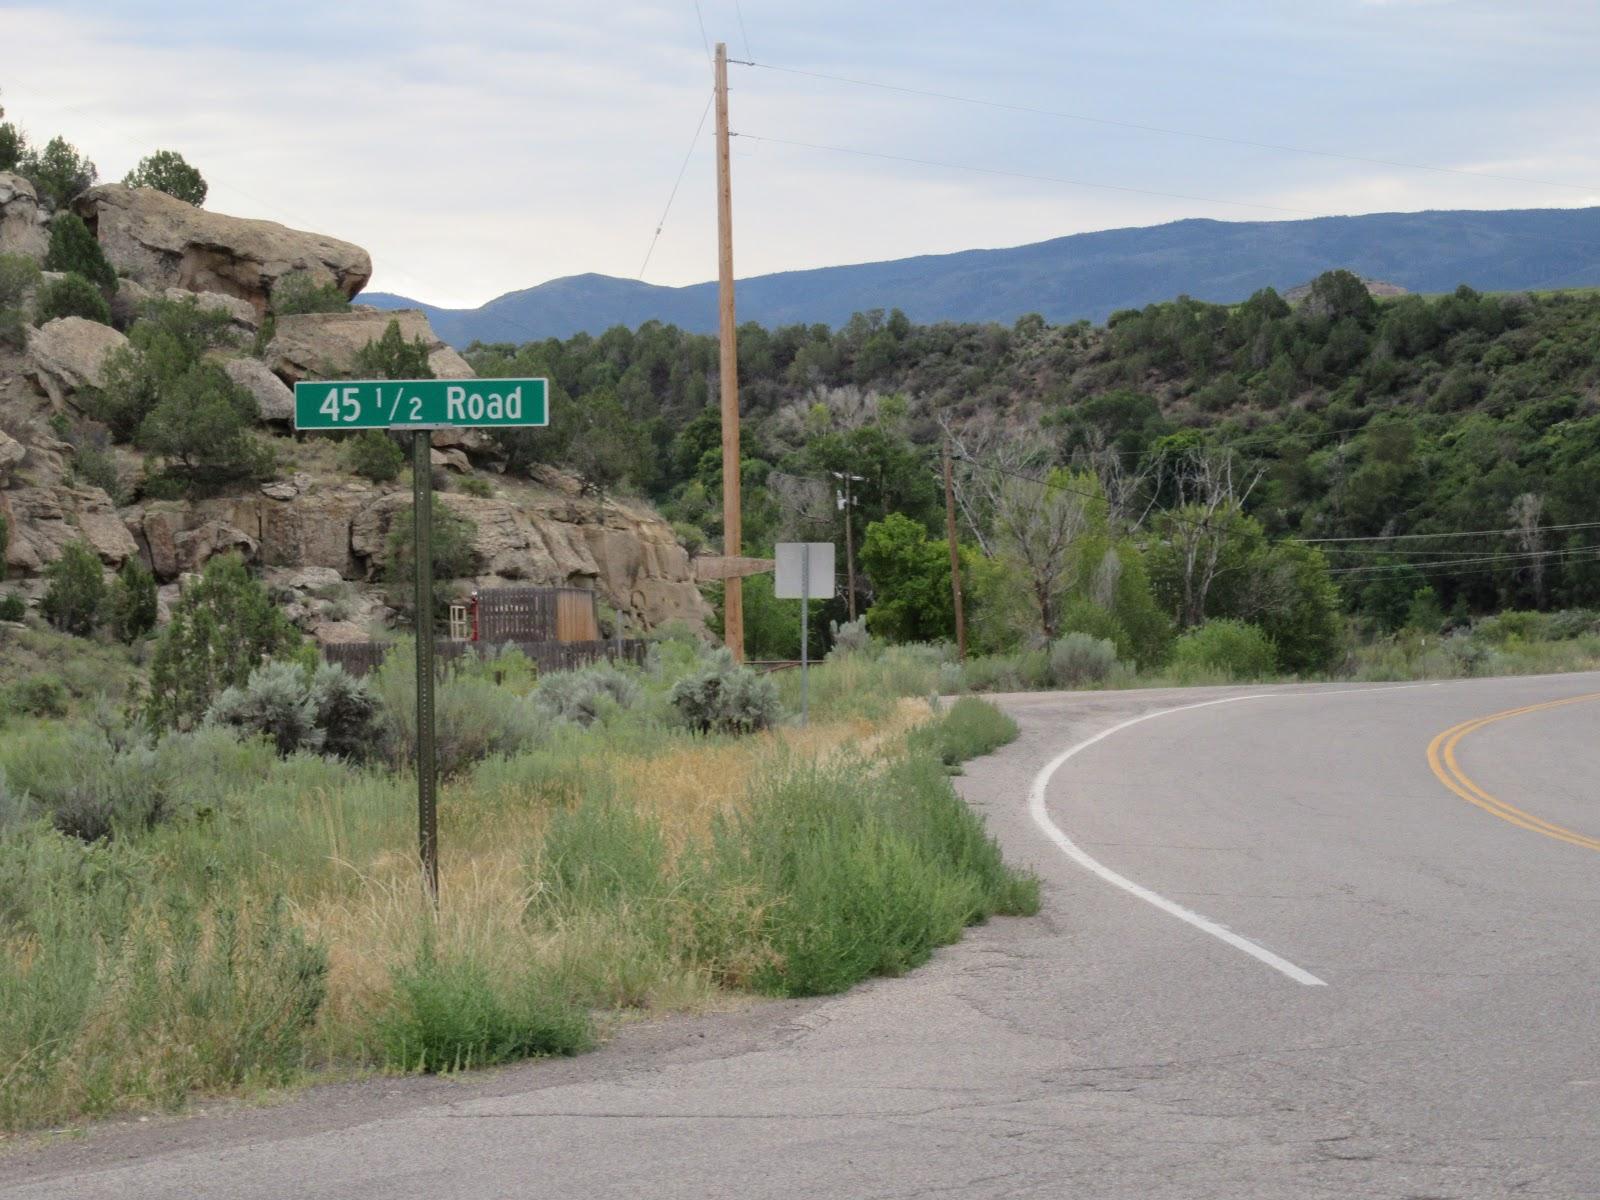 Climbing Grand Mesa North by bike - start of climb - road and road sign - 45 1/2 road